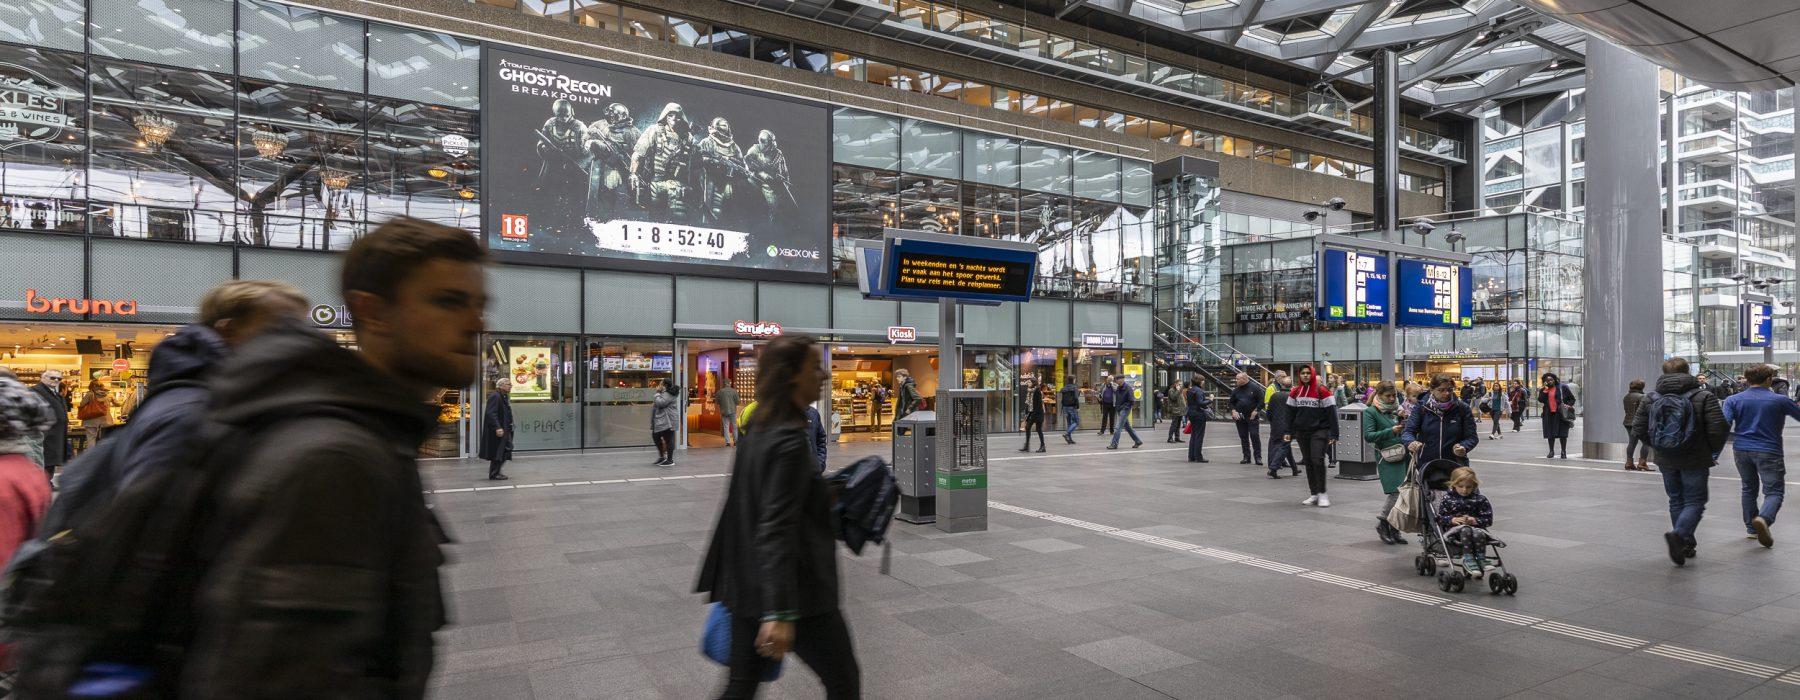 Ubisoft case Den Haag Centraal